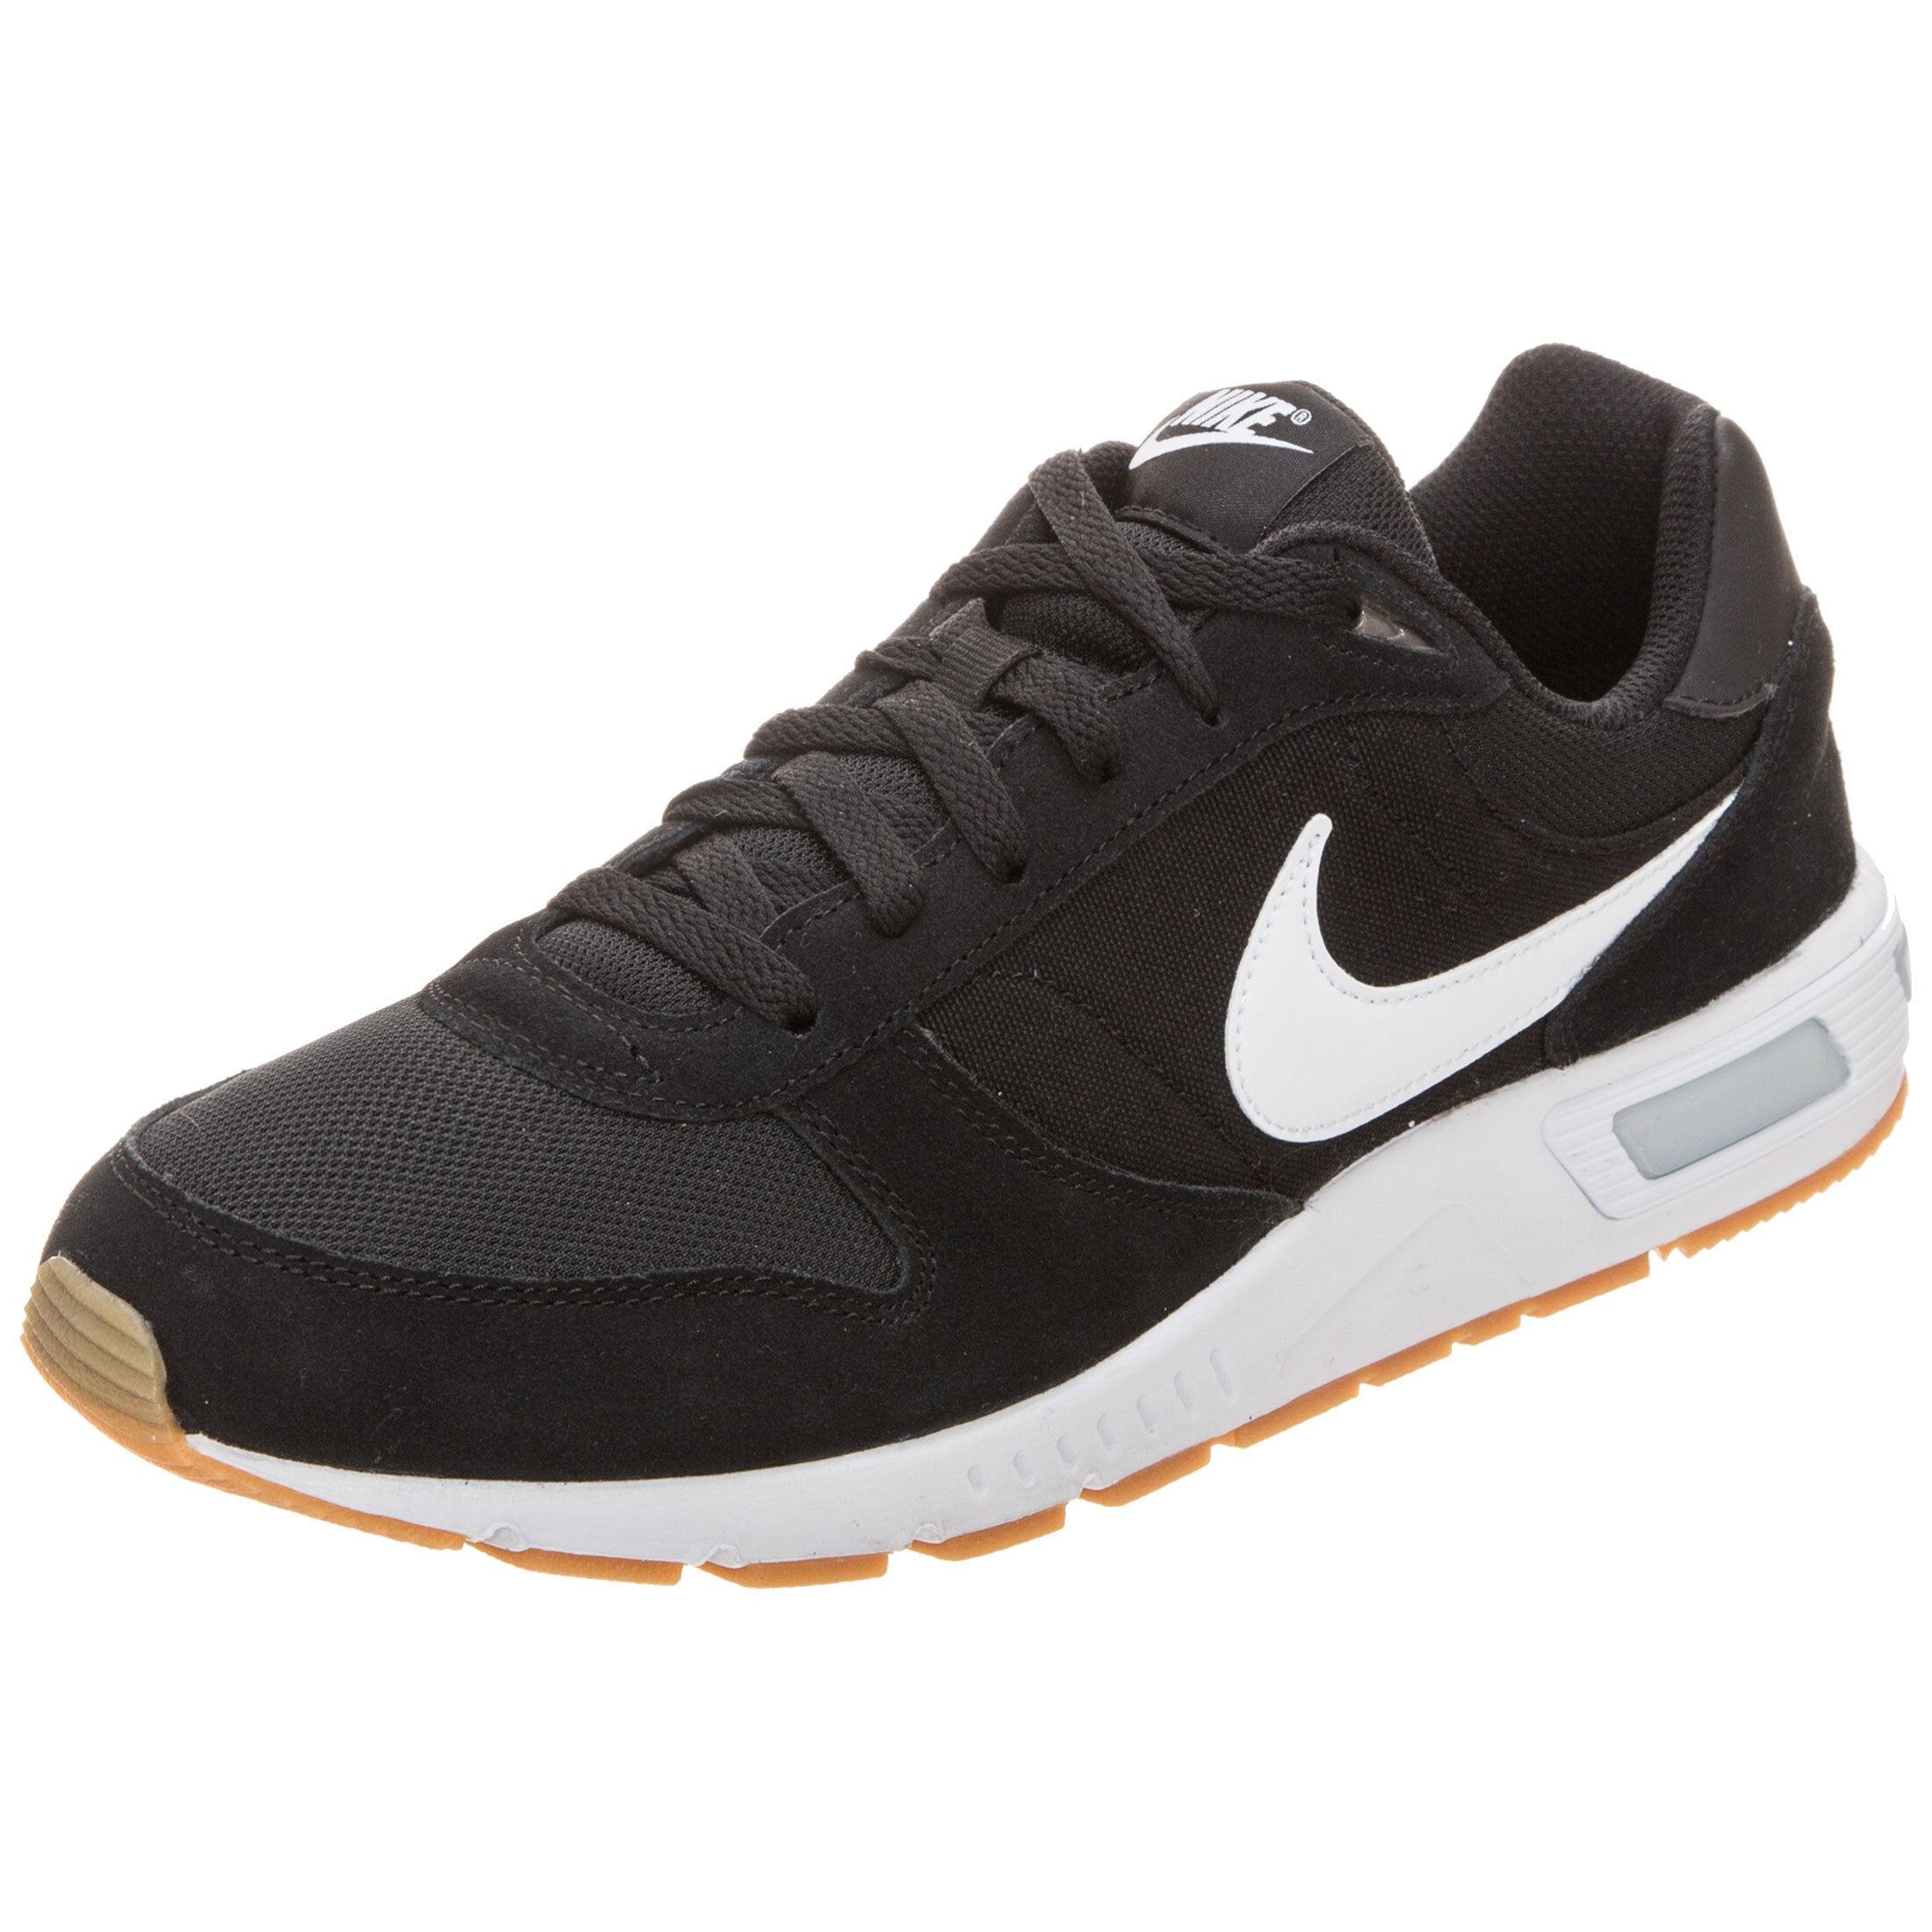 Nike Sportswear Nightgazer Turnschuhe Herren bei OUTFITTER Große Klassifizierung